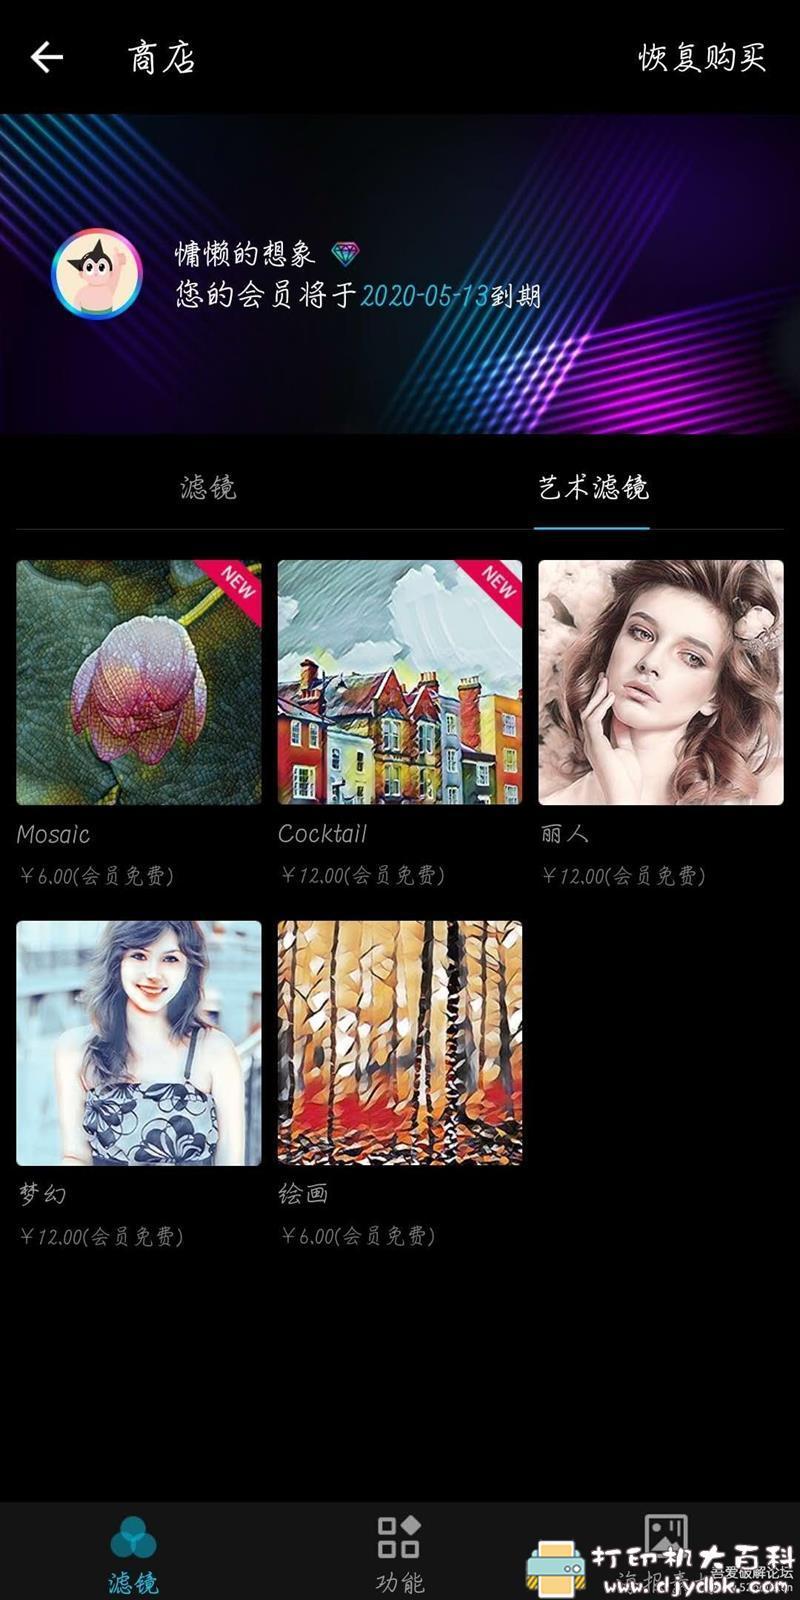 [Android]图片美化工具 MIX滤镜大师 v4.9.9 VIP版图片 No.3